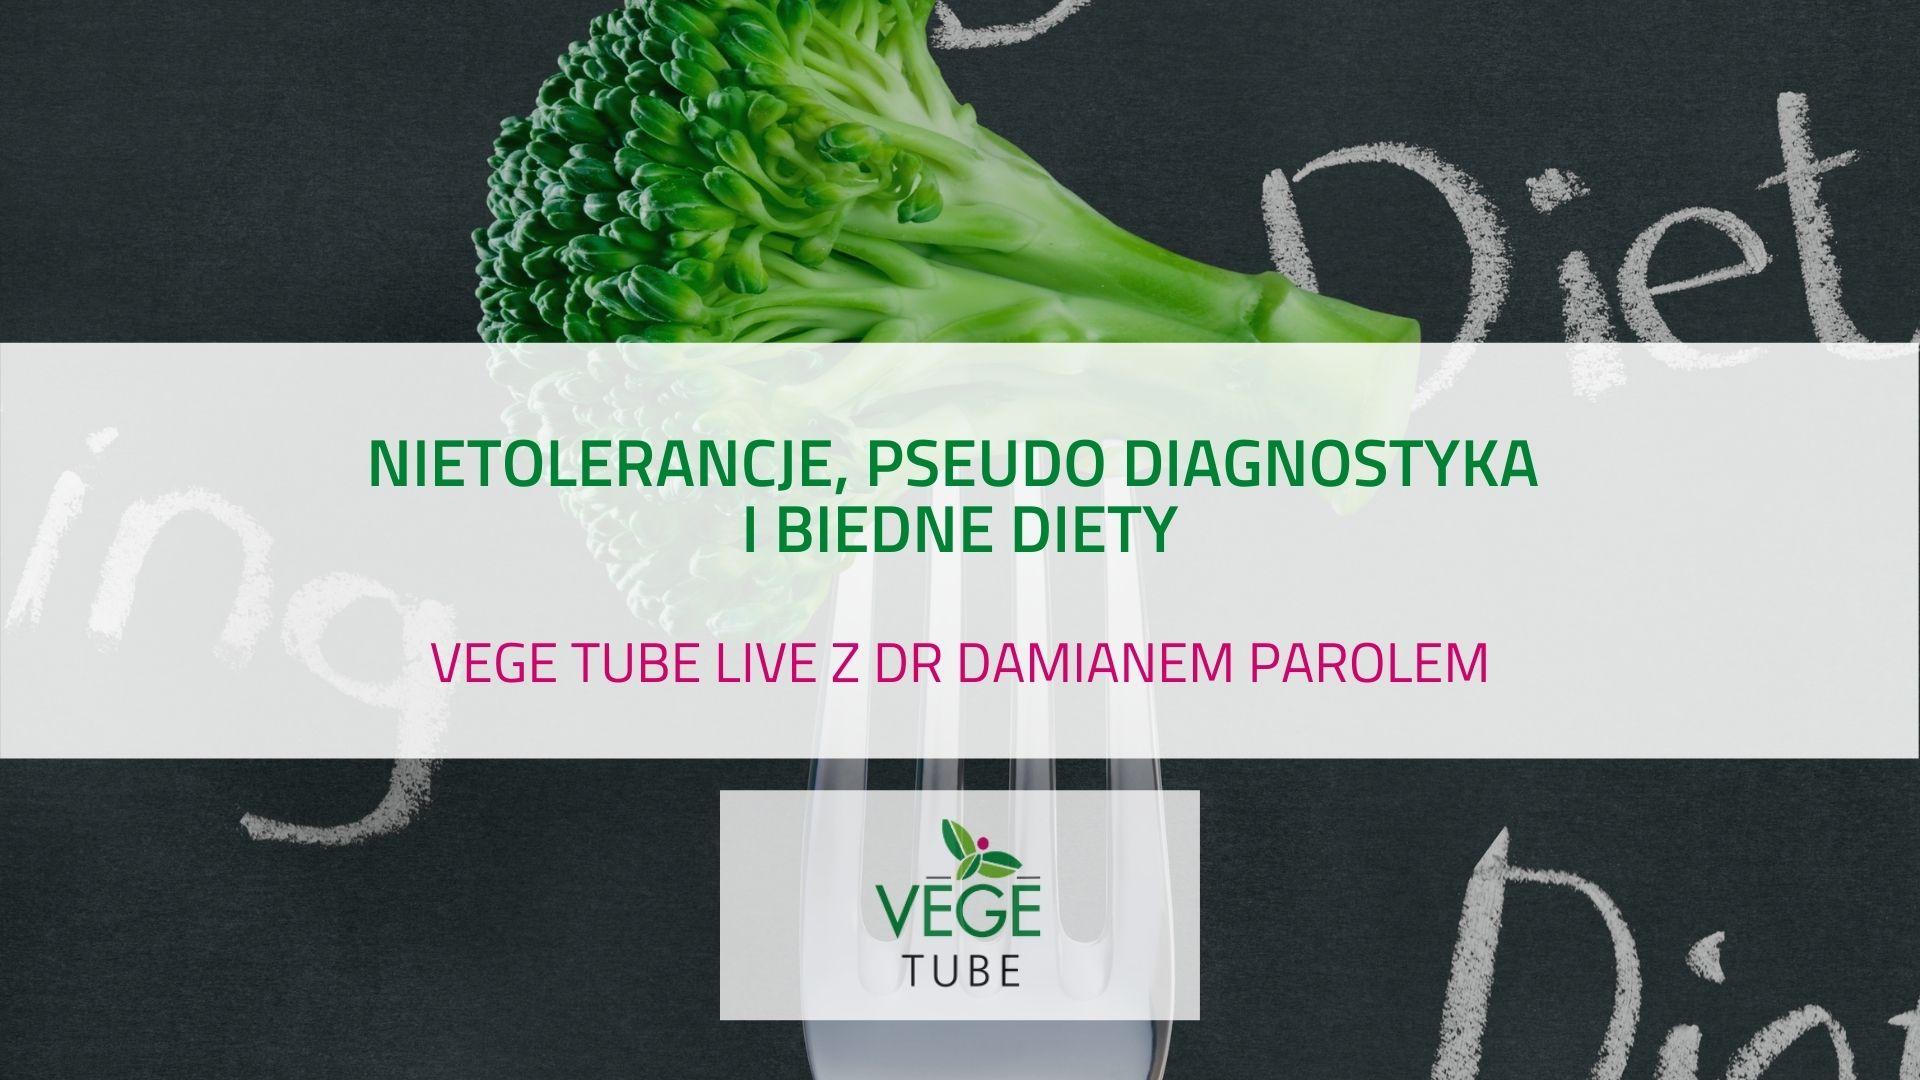 Nietolerancje, pseudo diagnostyka i biedne diety